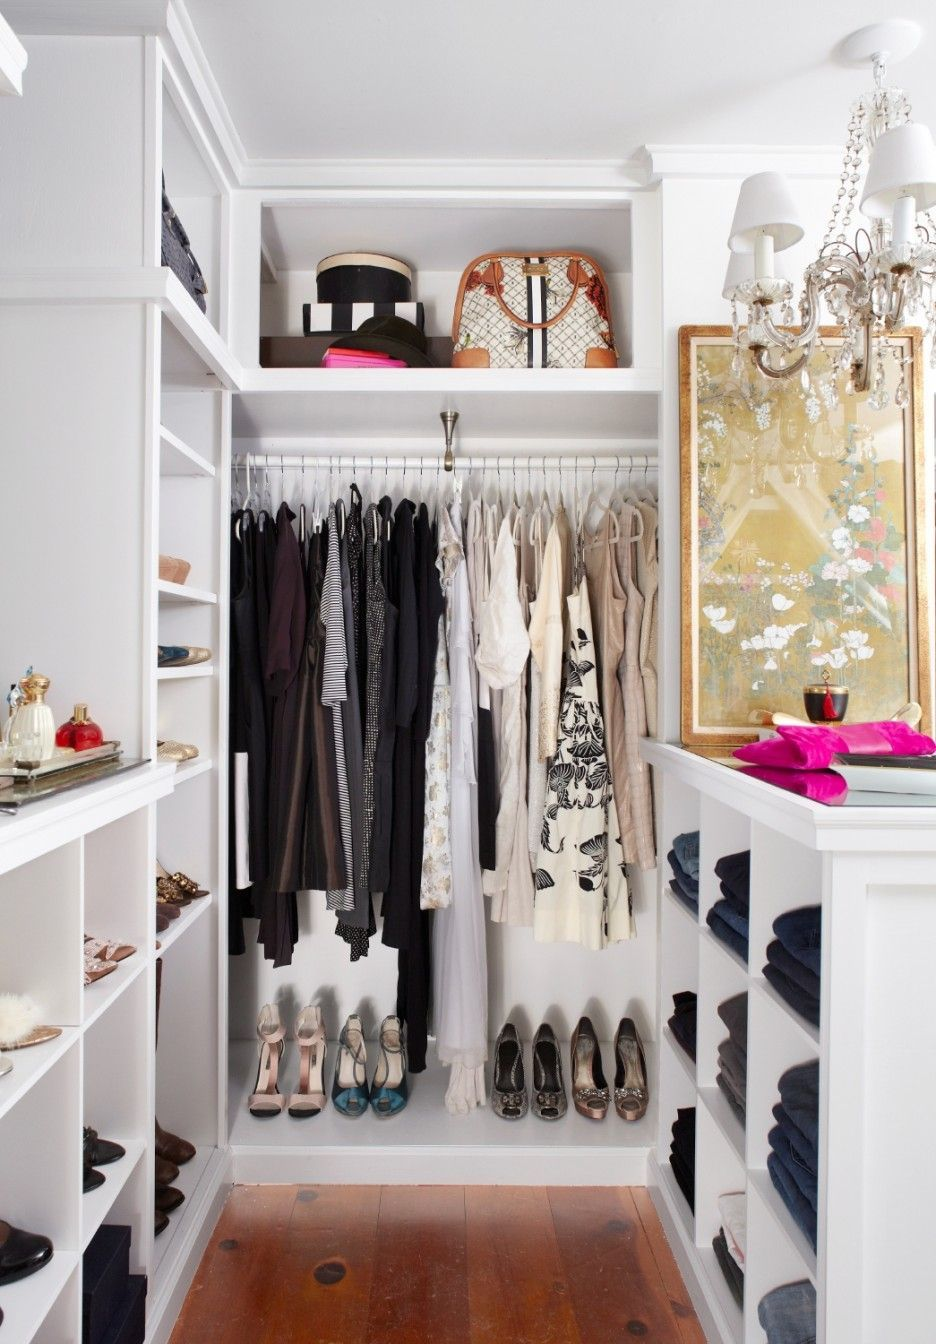 Awesome Small Walk In Closet Organization Ideas Part - 6: Incredible Small Walk-in Closet Ideas U0026 Makeovers | Small Walk In #Closet  Ideas